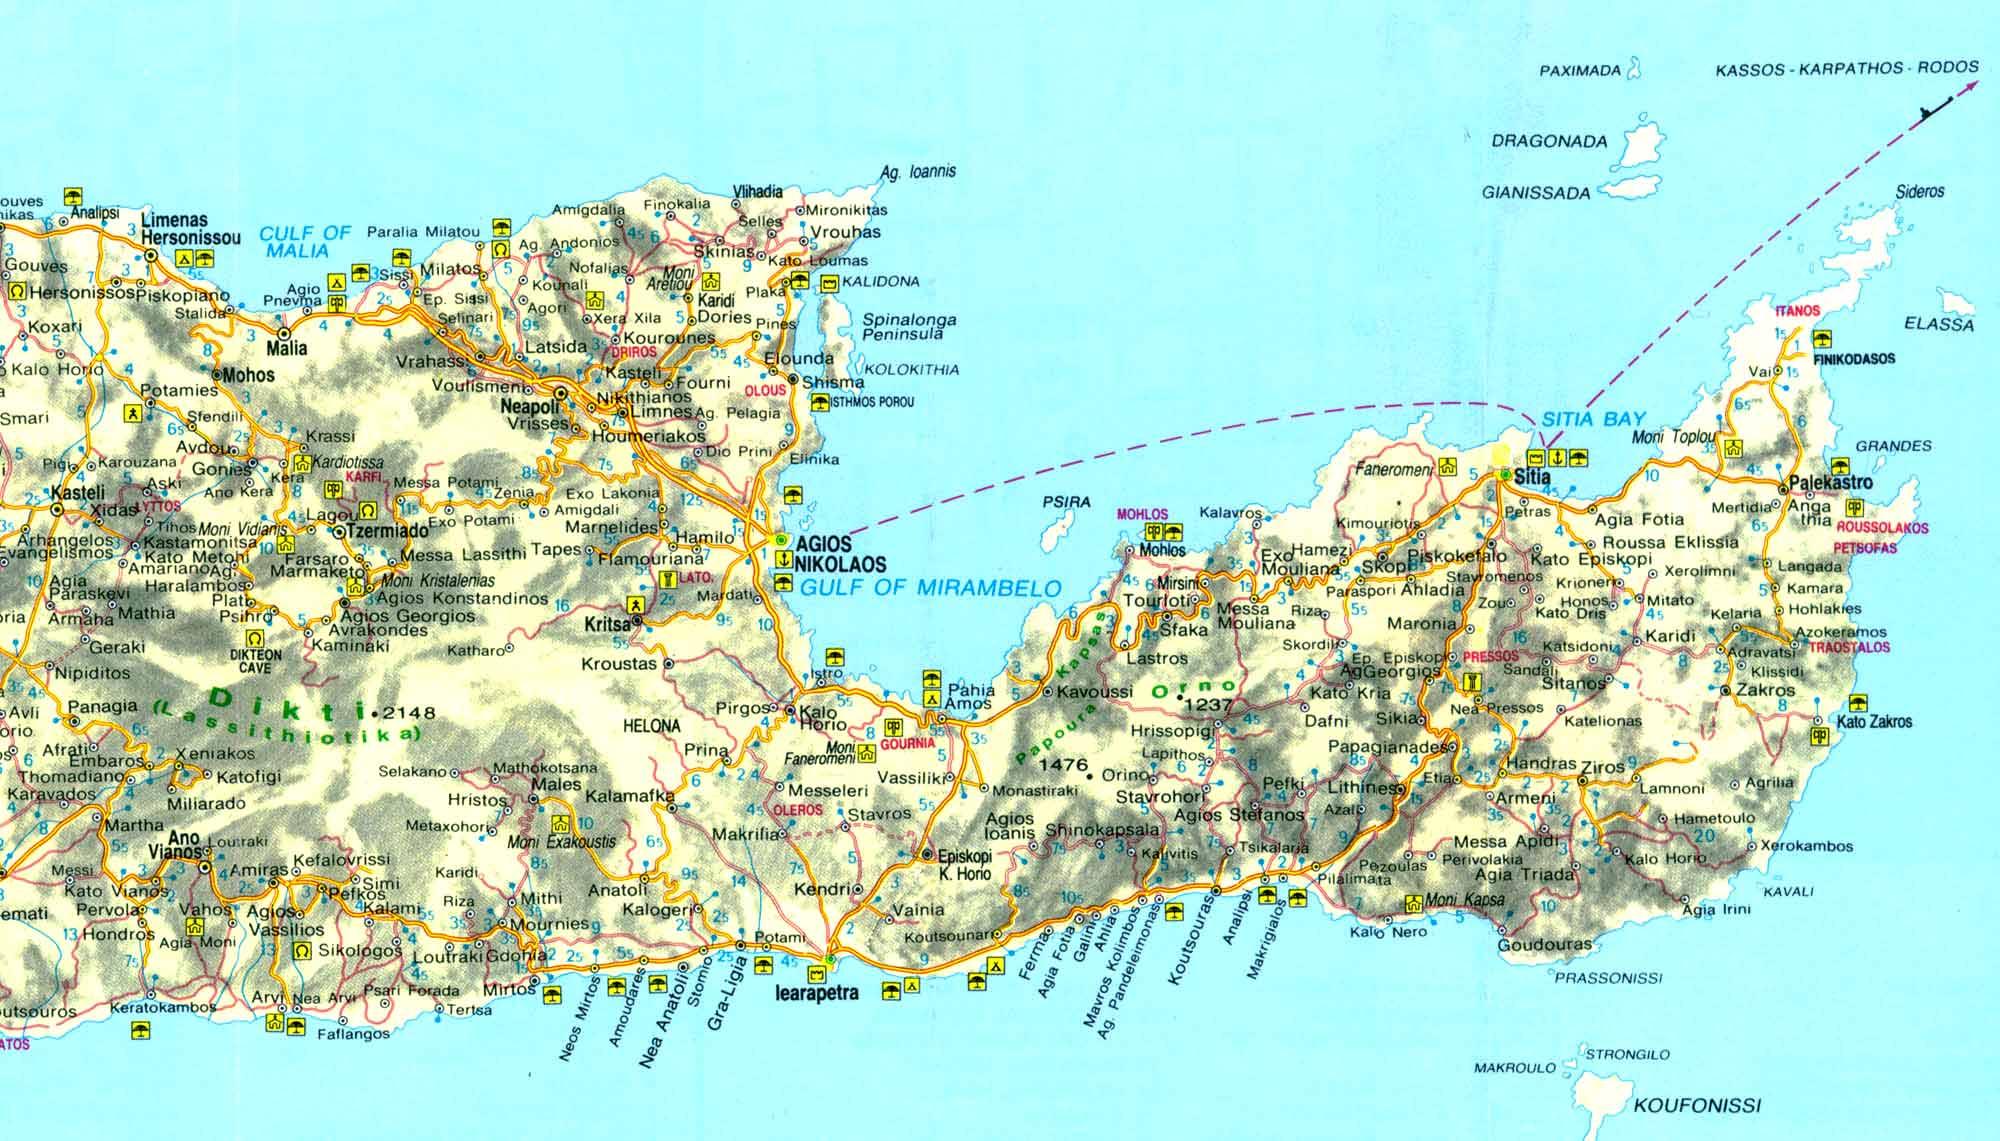 maps of crete and east crete